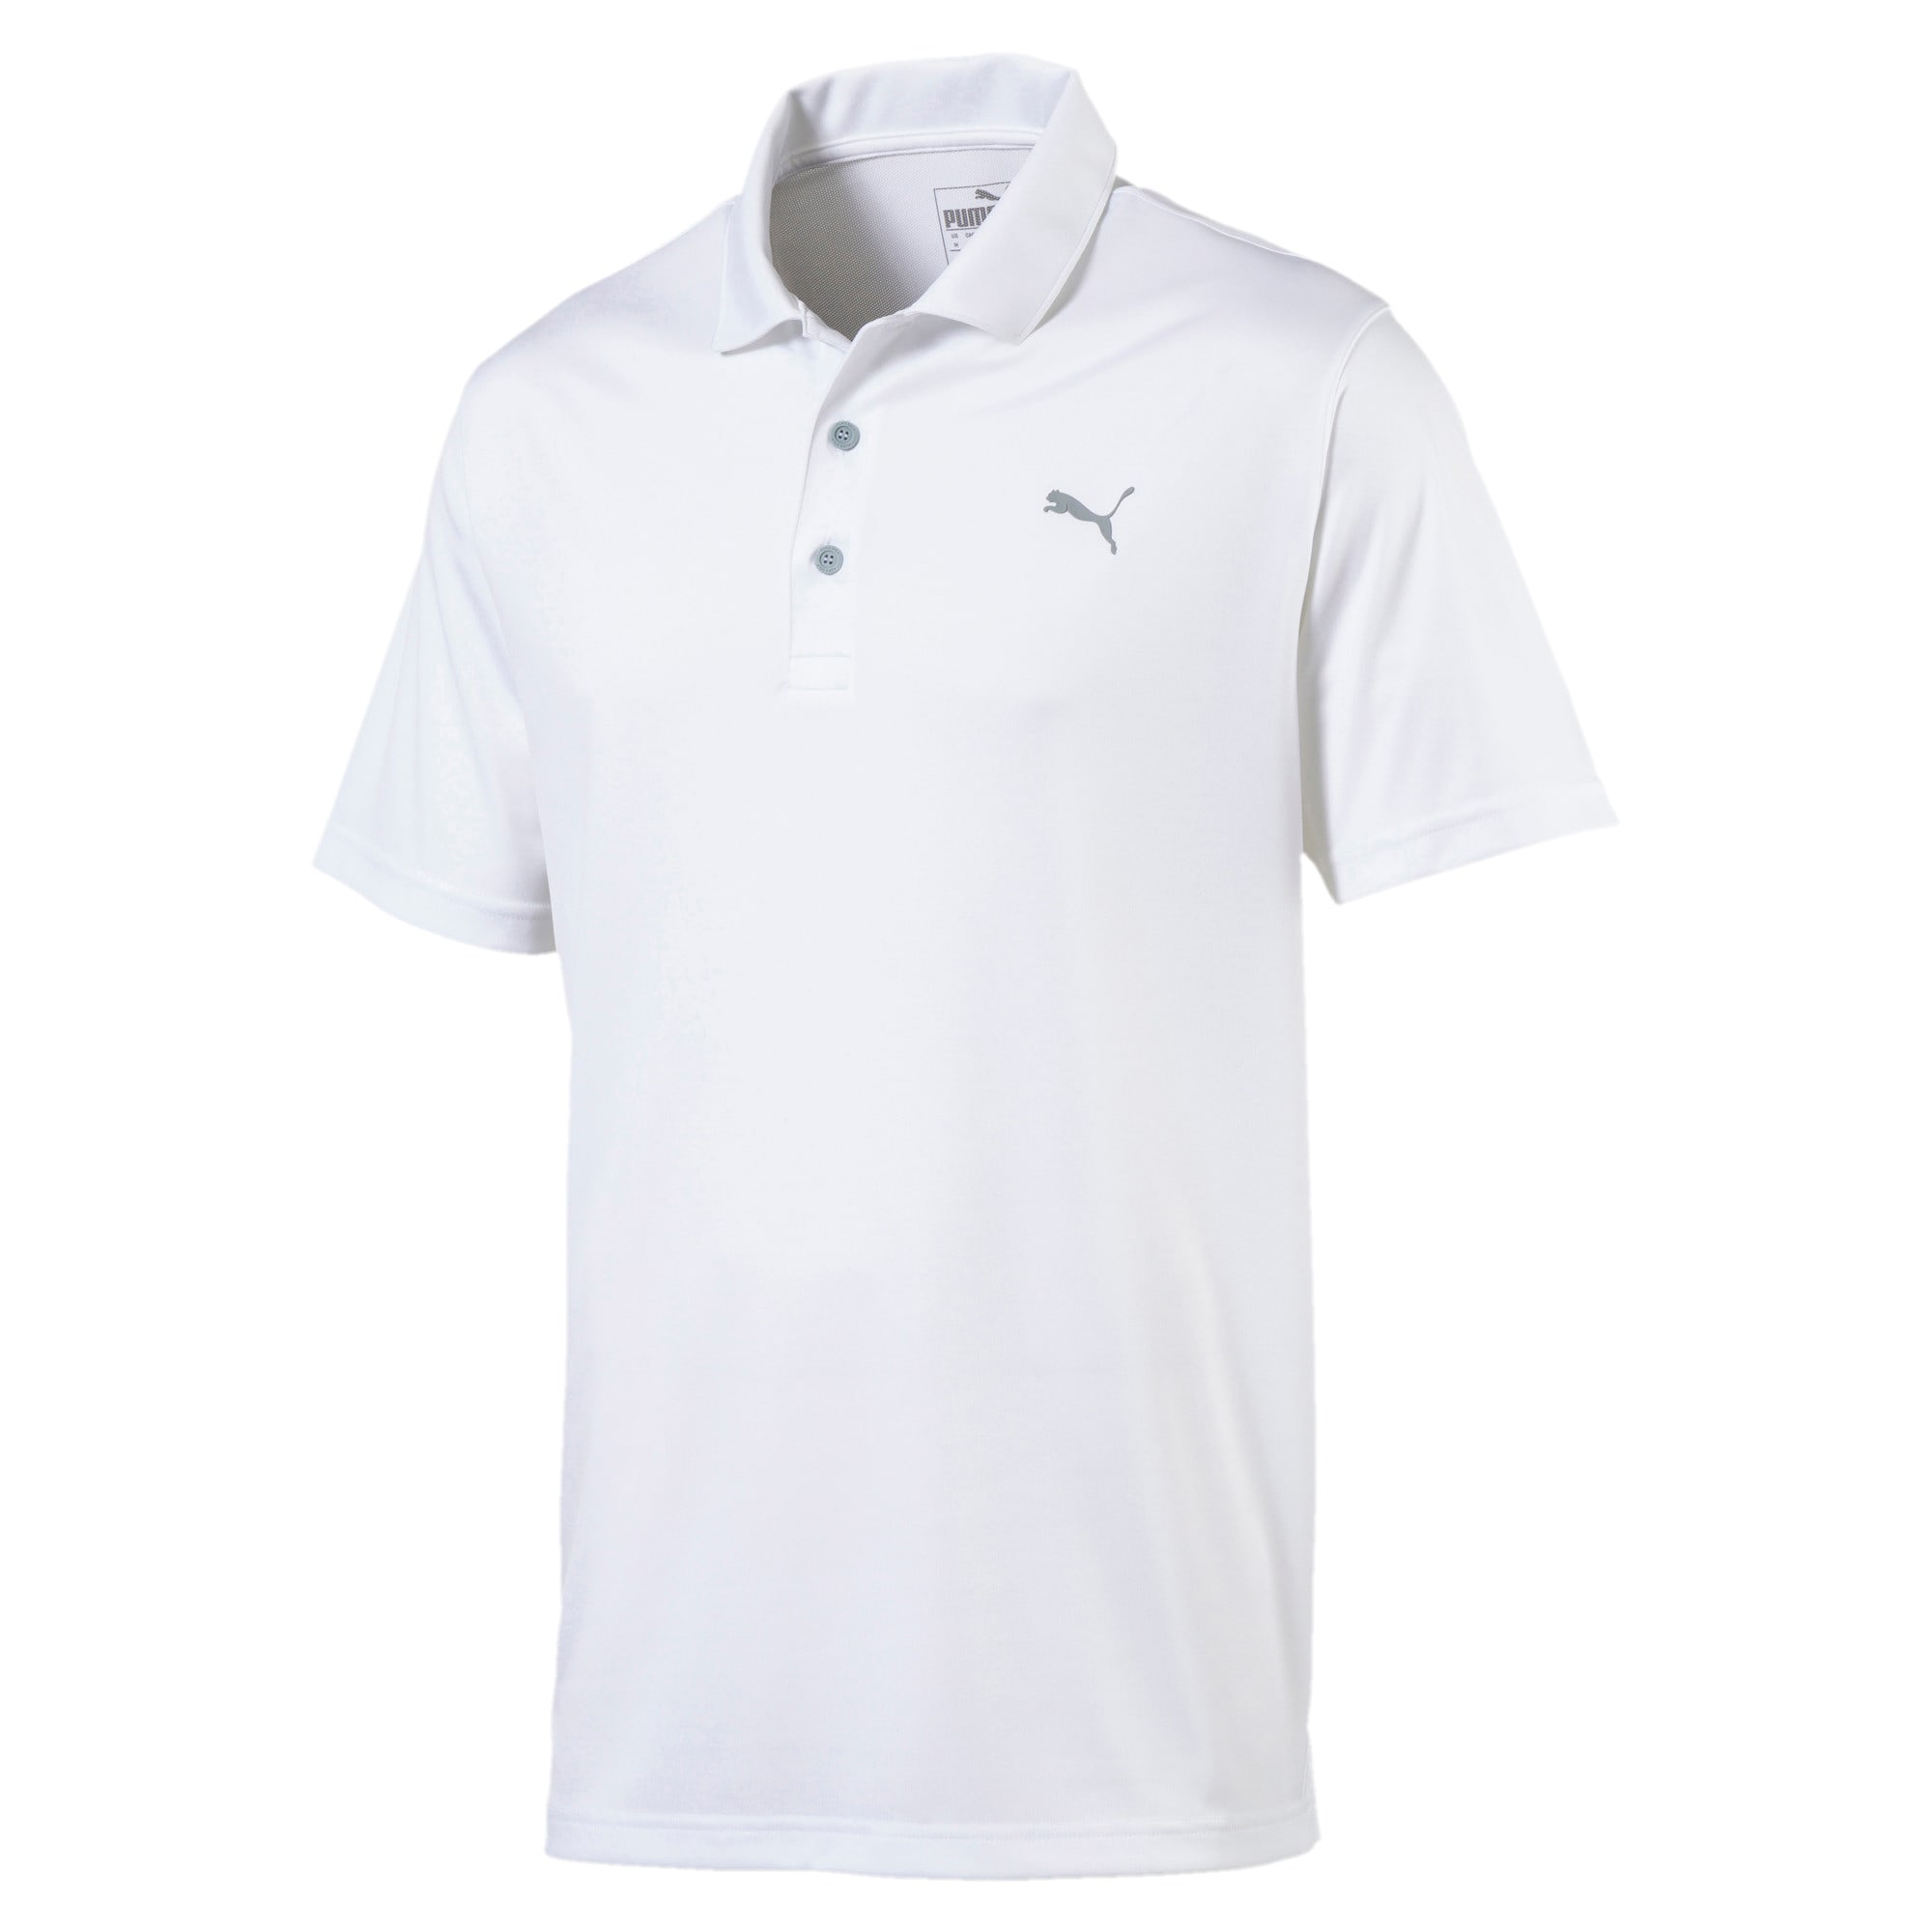 Thumbnail 4 of Rotation Herren Golf Polo, Bright White, medium